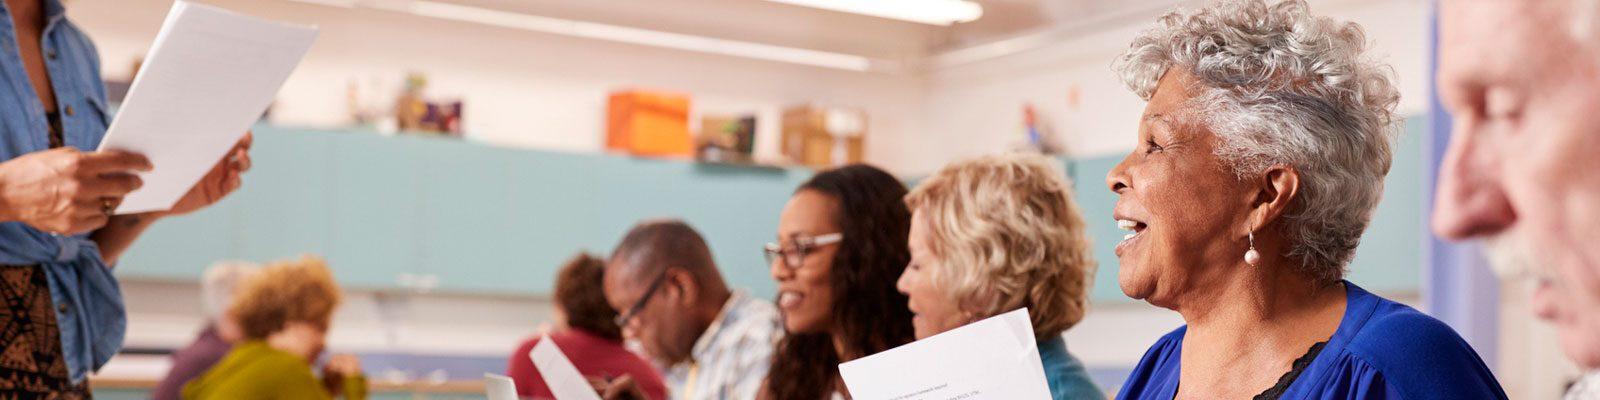 Adults in classroom setting